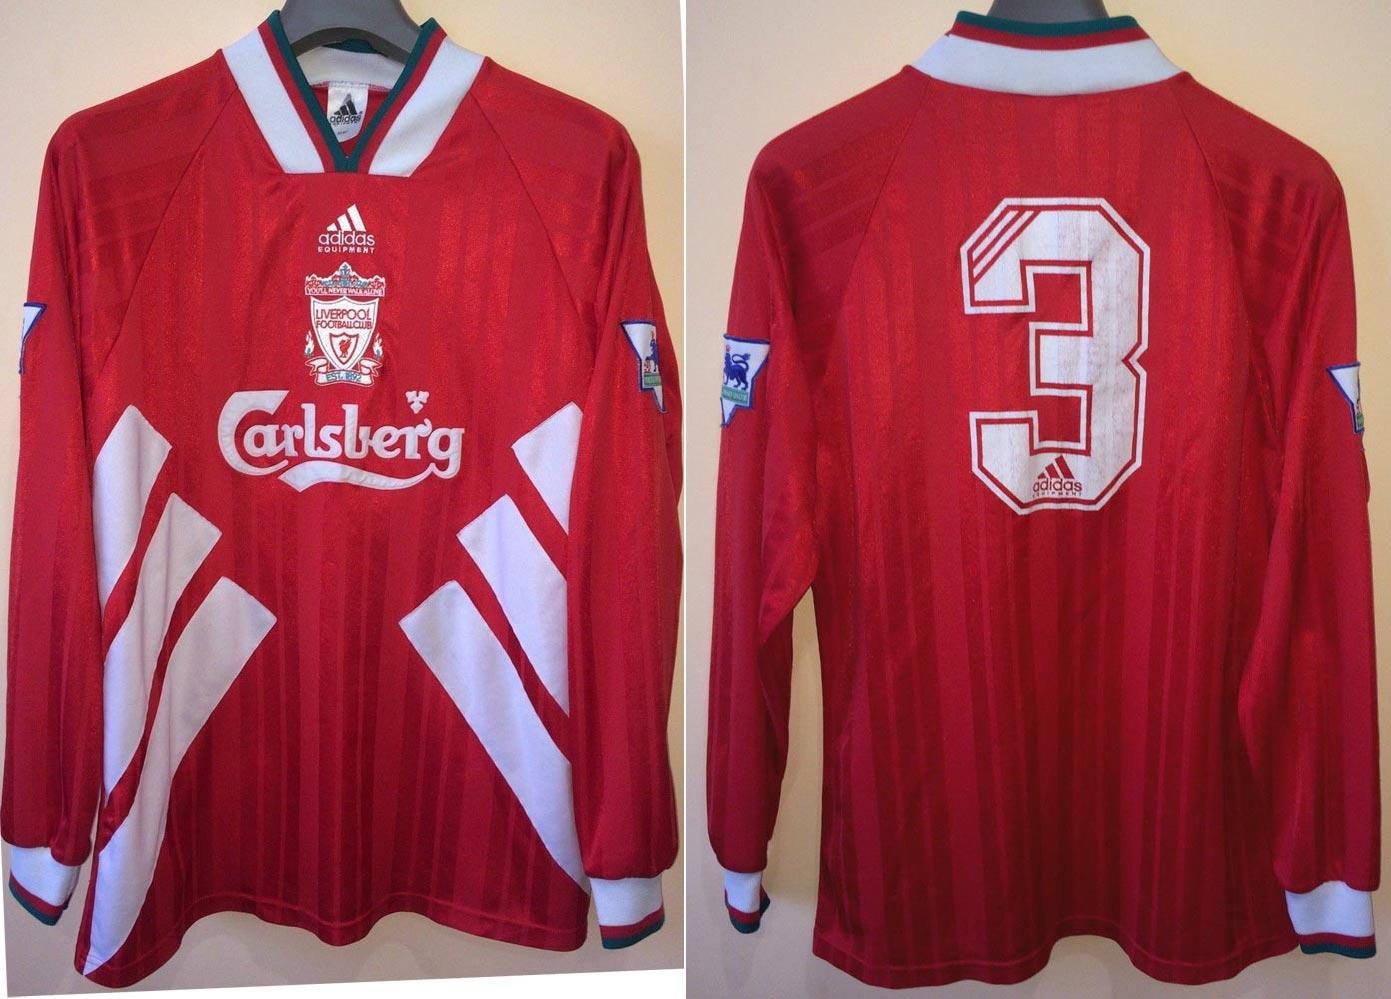 6f61983e3 1993-94 Friendly main team Home player shirt long sleeve № 3 Julian Dicks  (small Carlsberg logo) - image with site eBay www.ebay.com